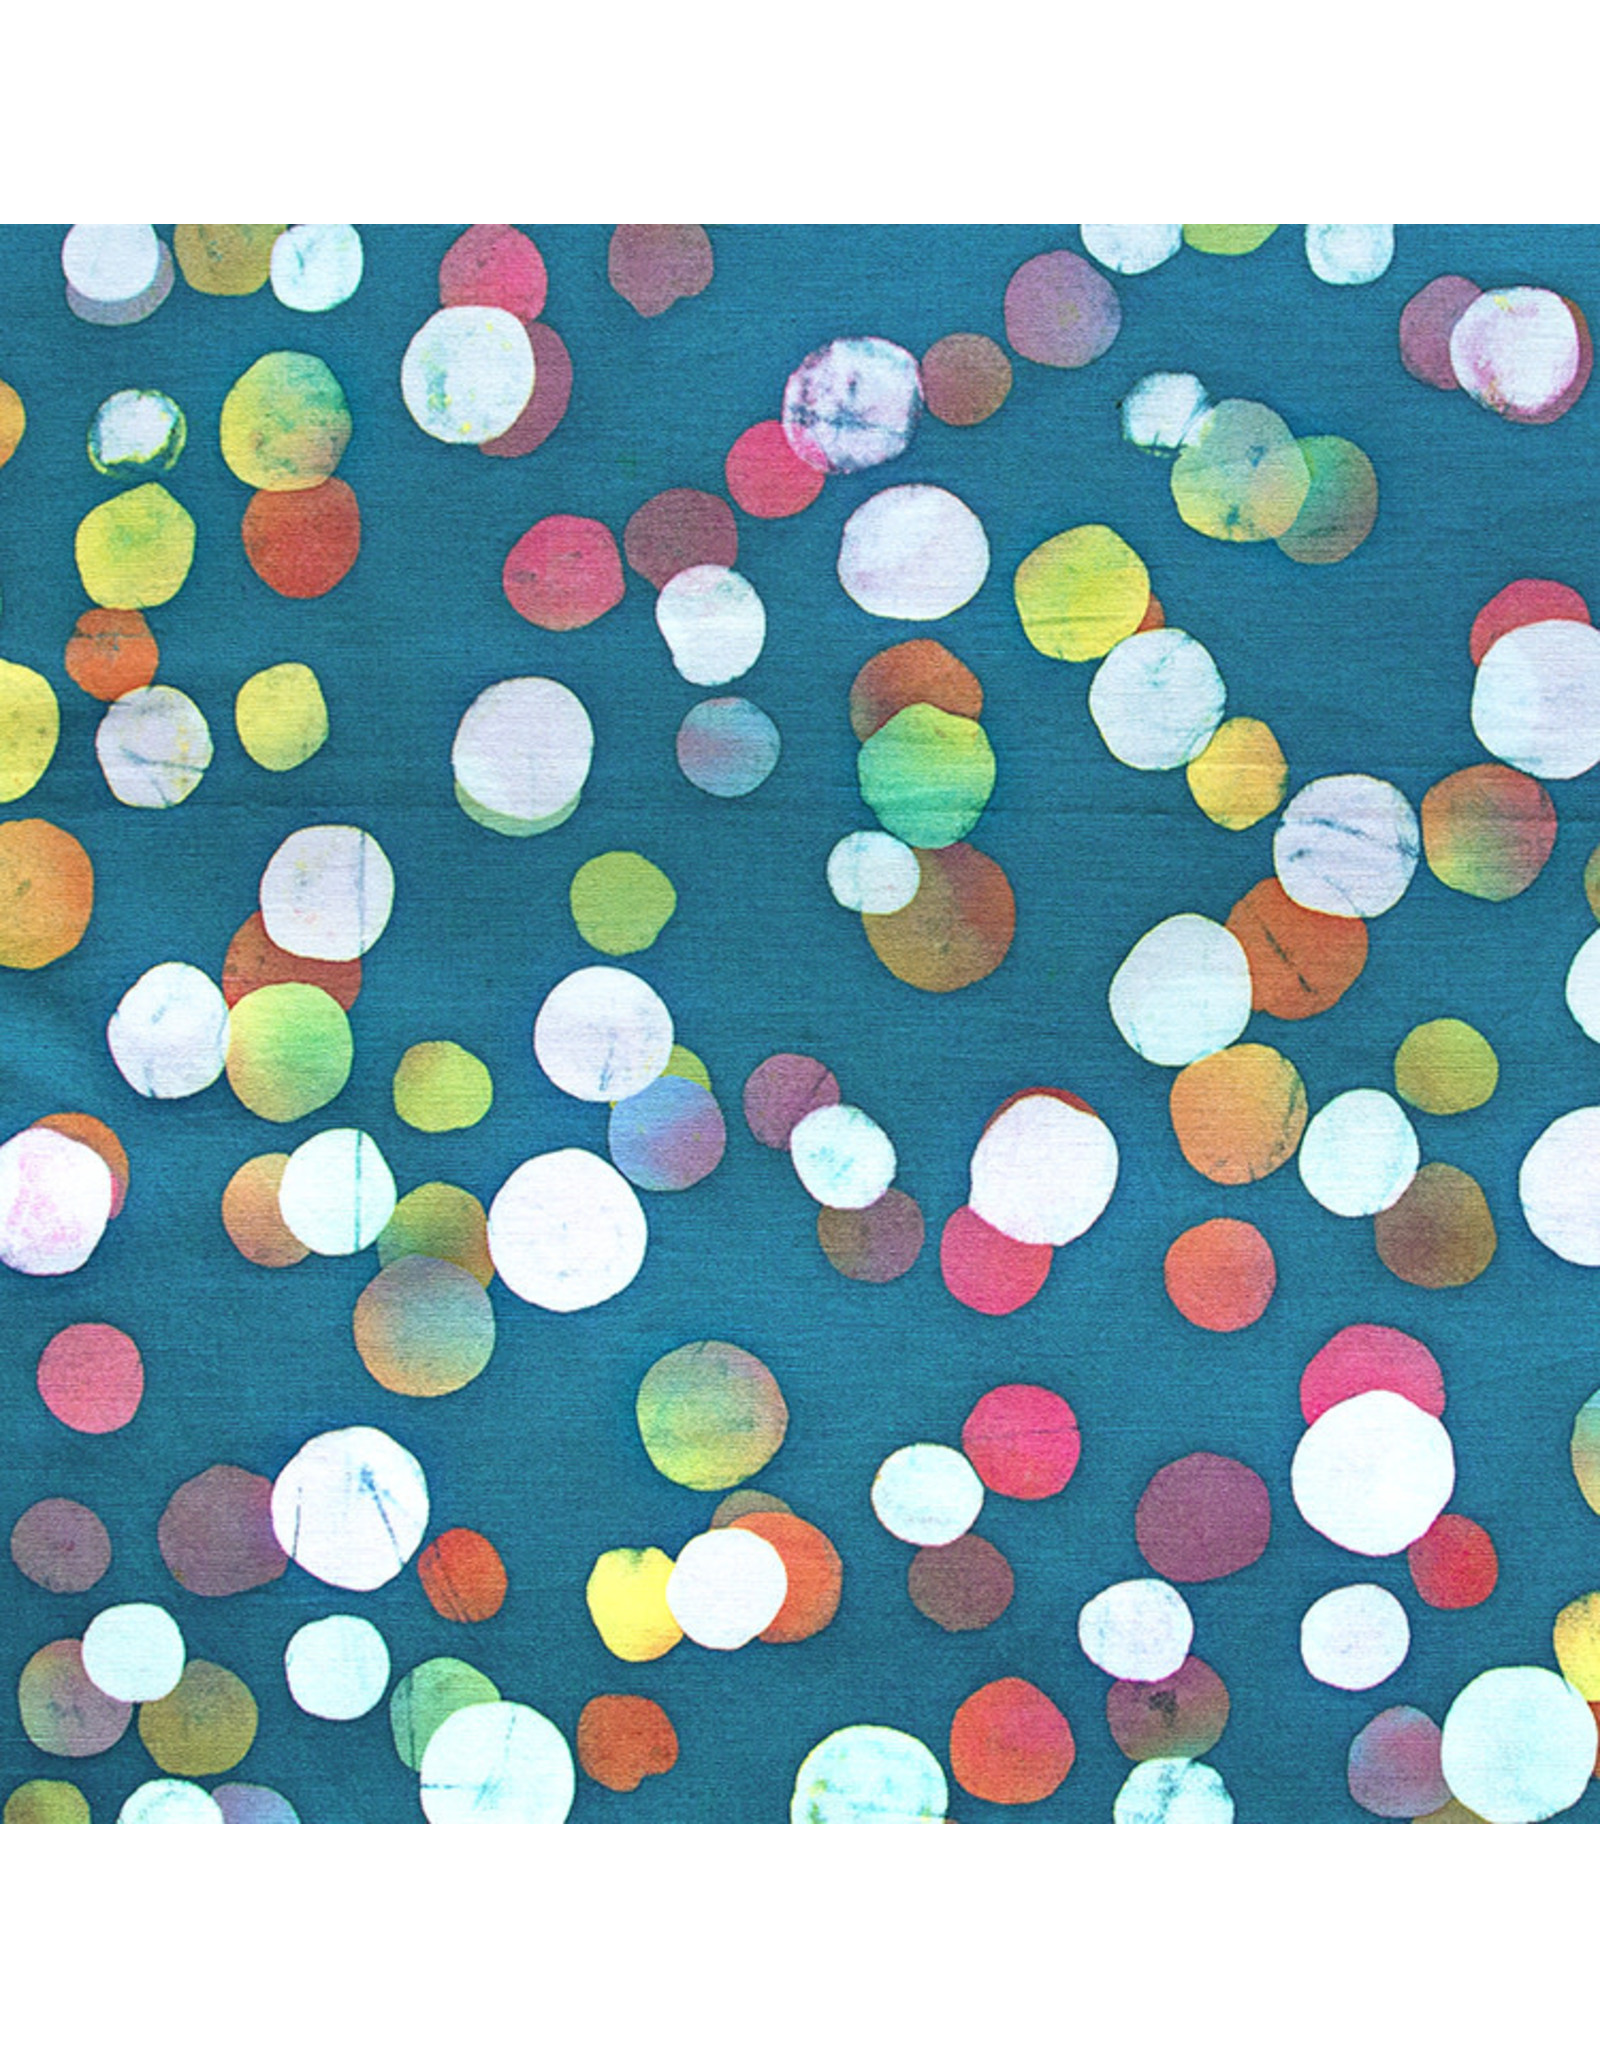 Northcott Color Me Banyan: Cotton Batik, Dot Necessities in Teal, Fabric Half-Yards